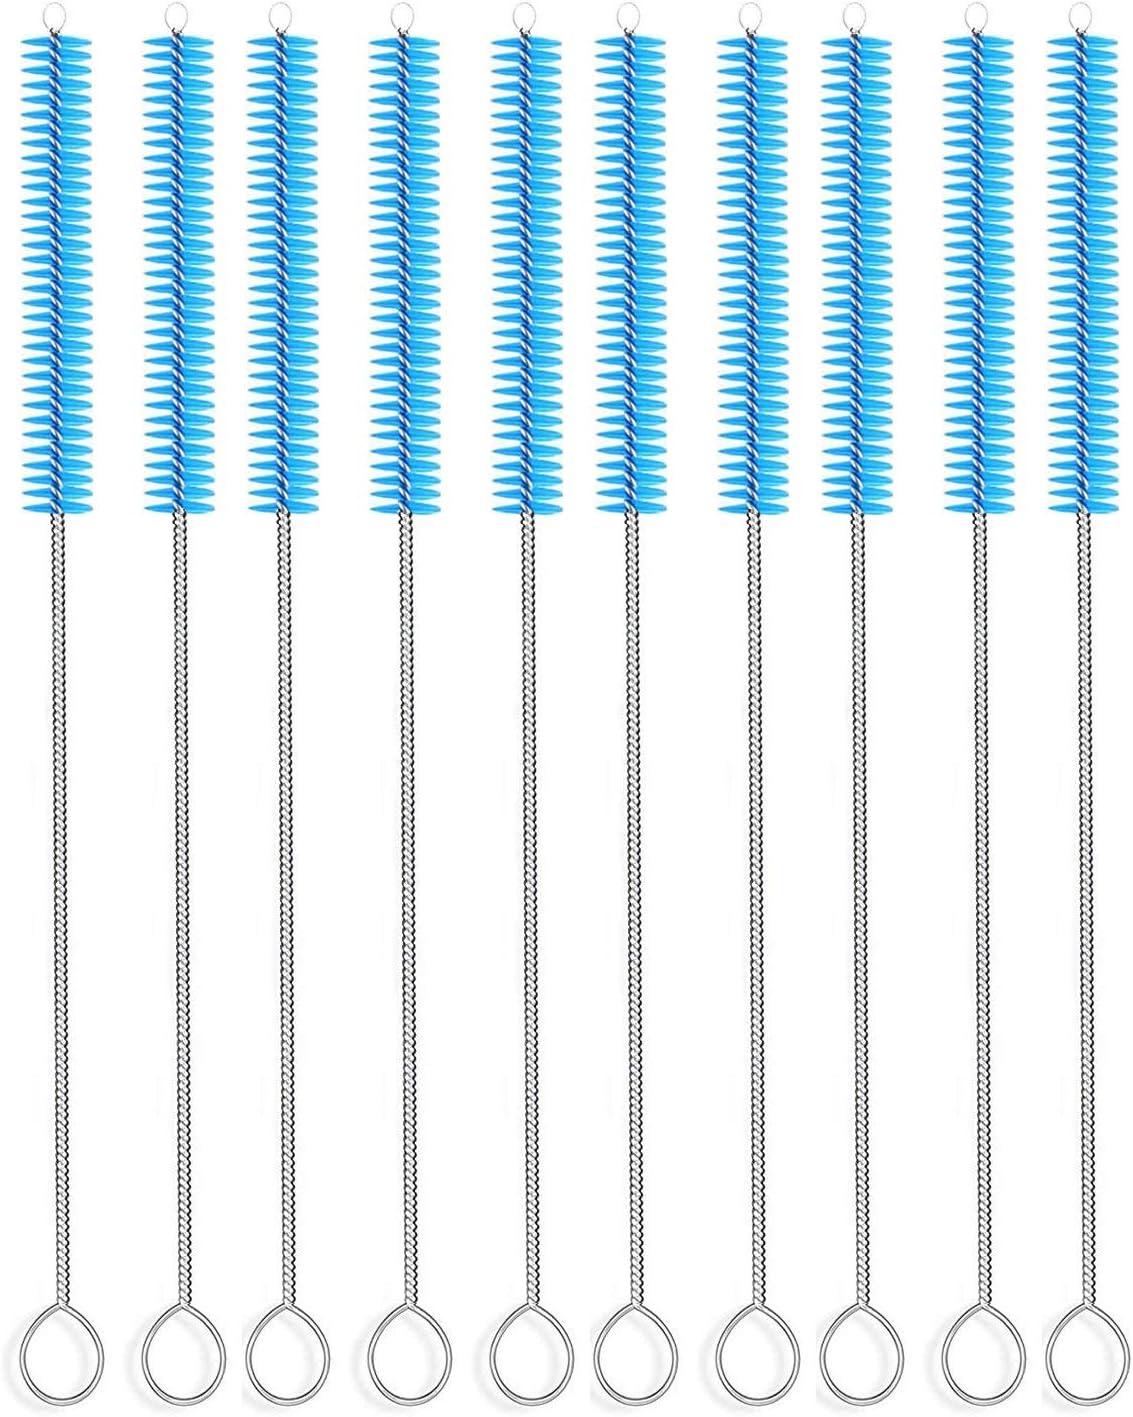 Long Straw Brush, Nylon Pipe Tube Cleaner 10-ihch X 2/5-inch Set of 10 (Blue)